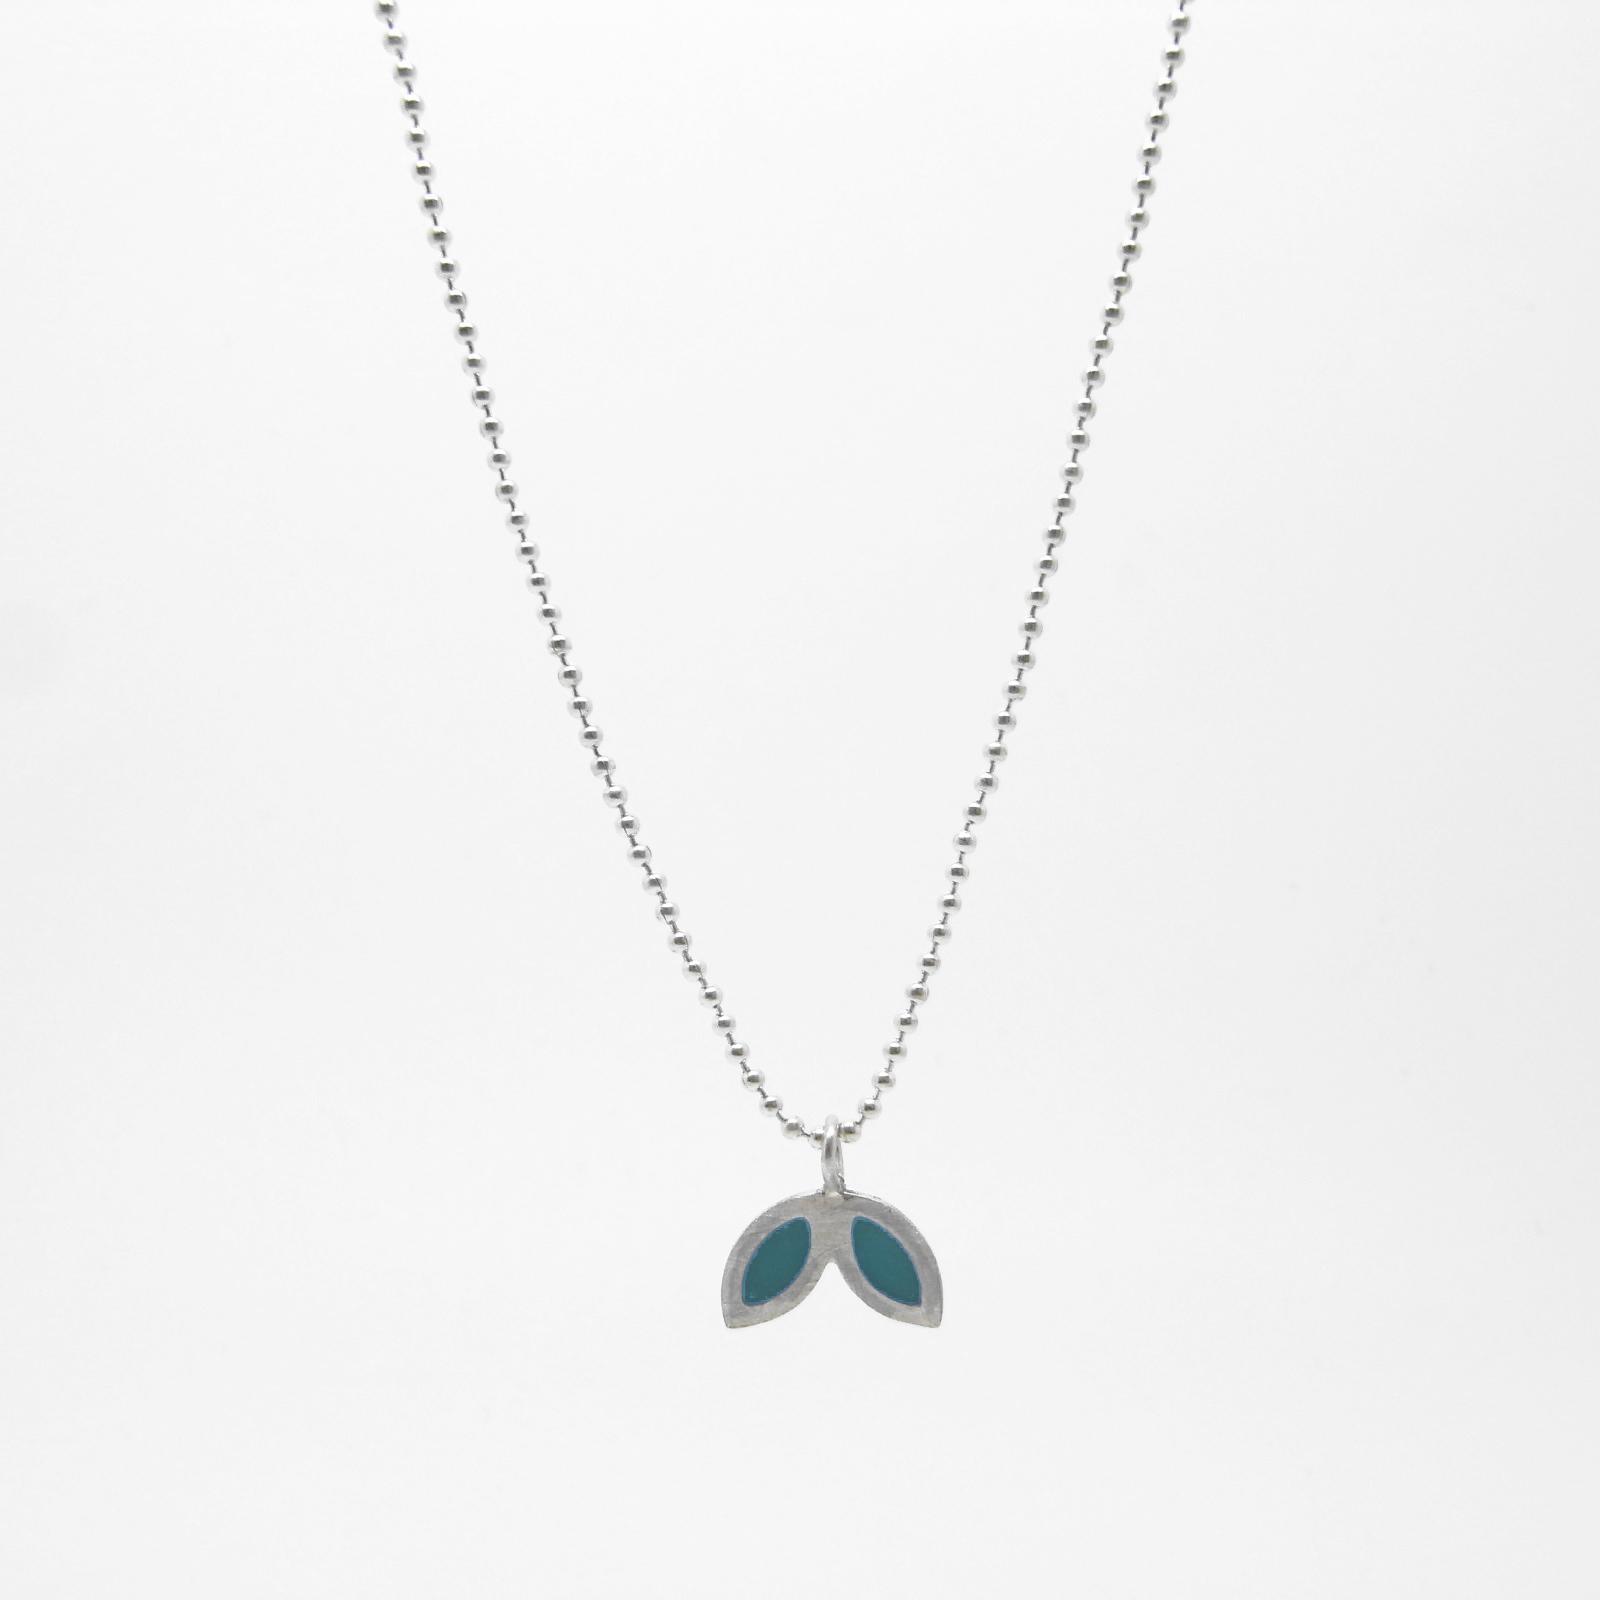 SALE - Silver Petal Necklace - Ocean Blue